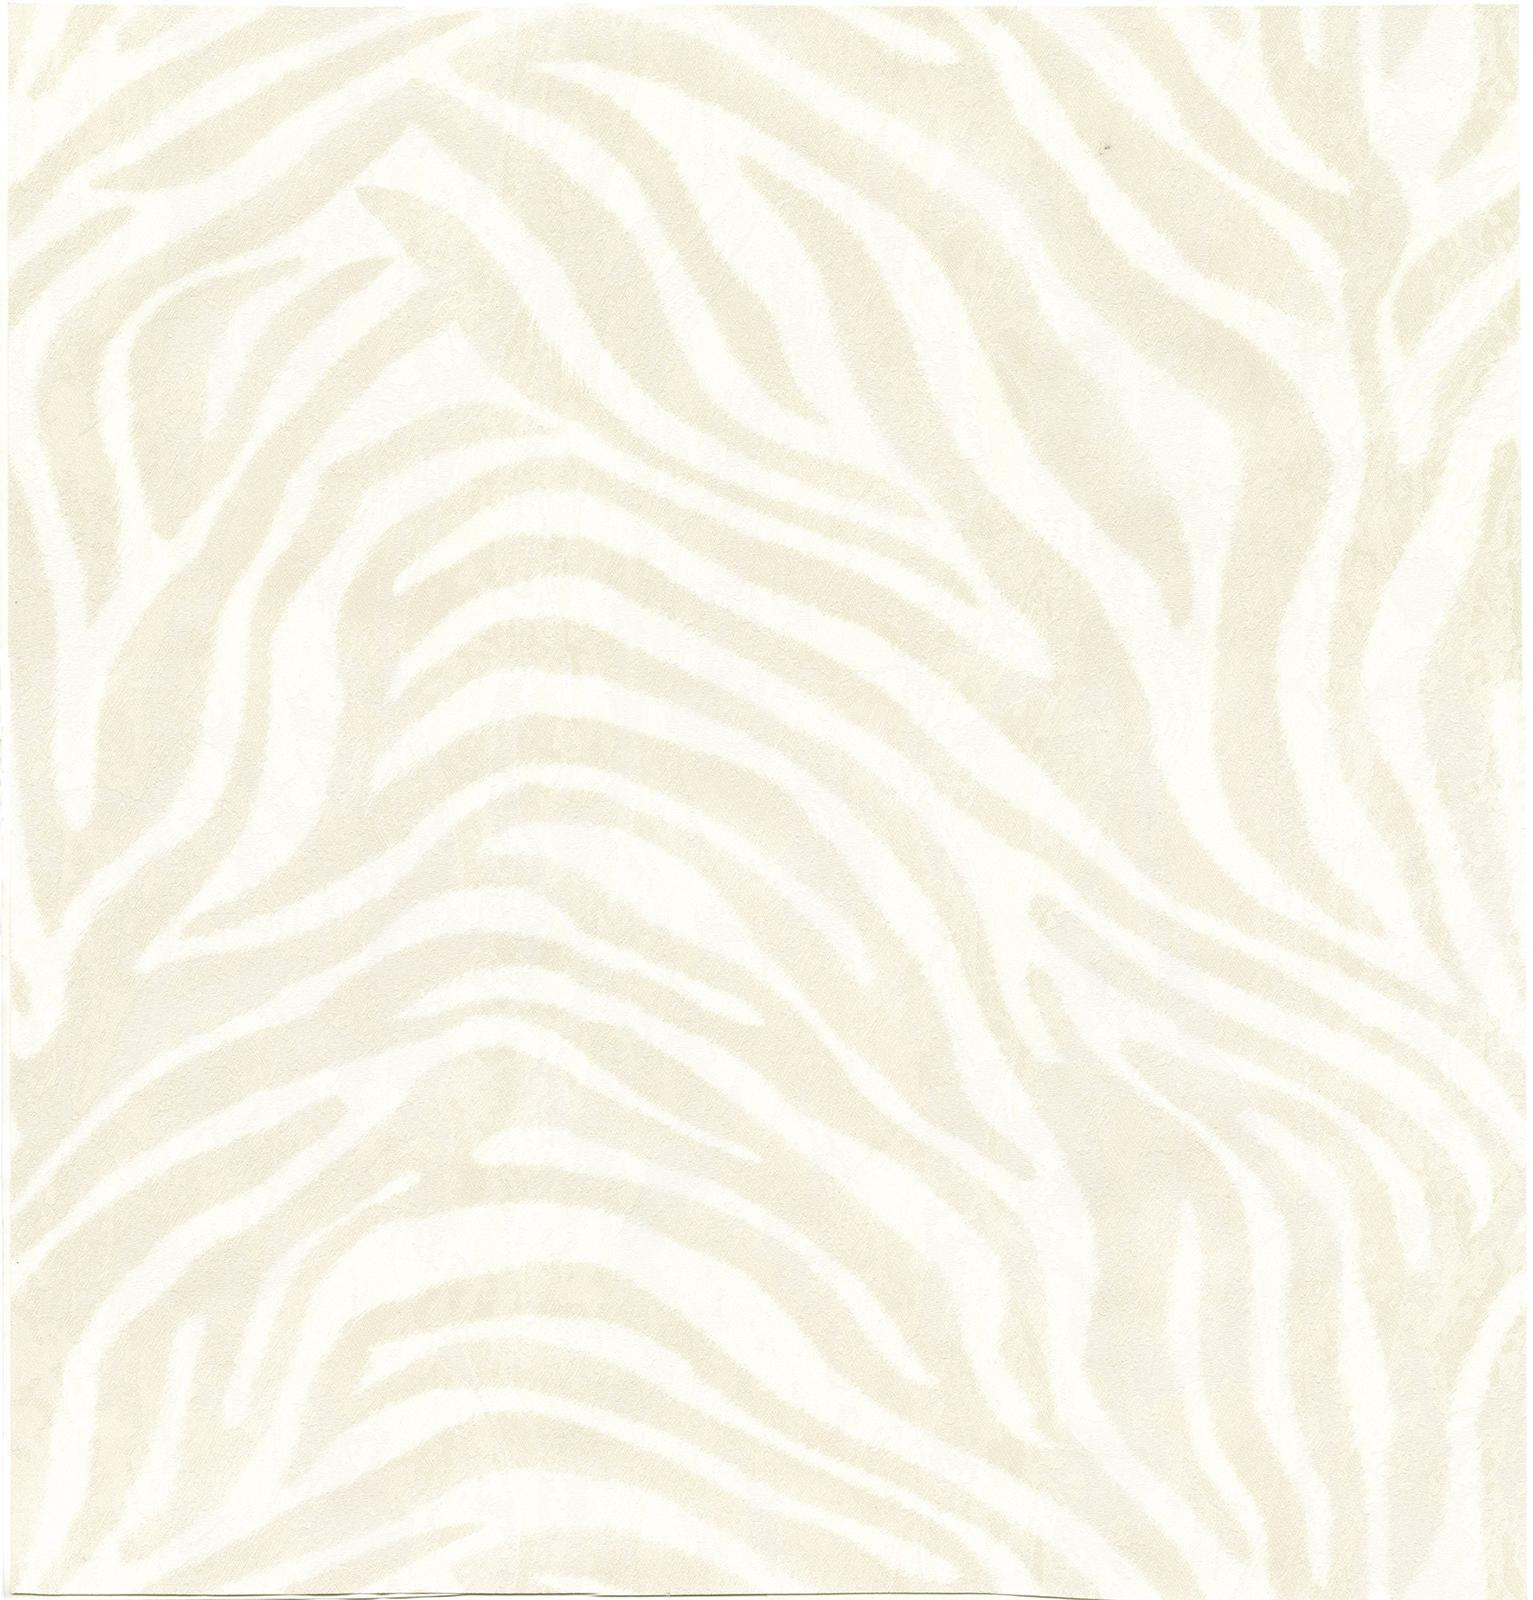 Roberto Cavalli Zebra RC12047 Wallpaper CreamWhite Fashion 1533x1600